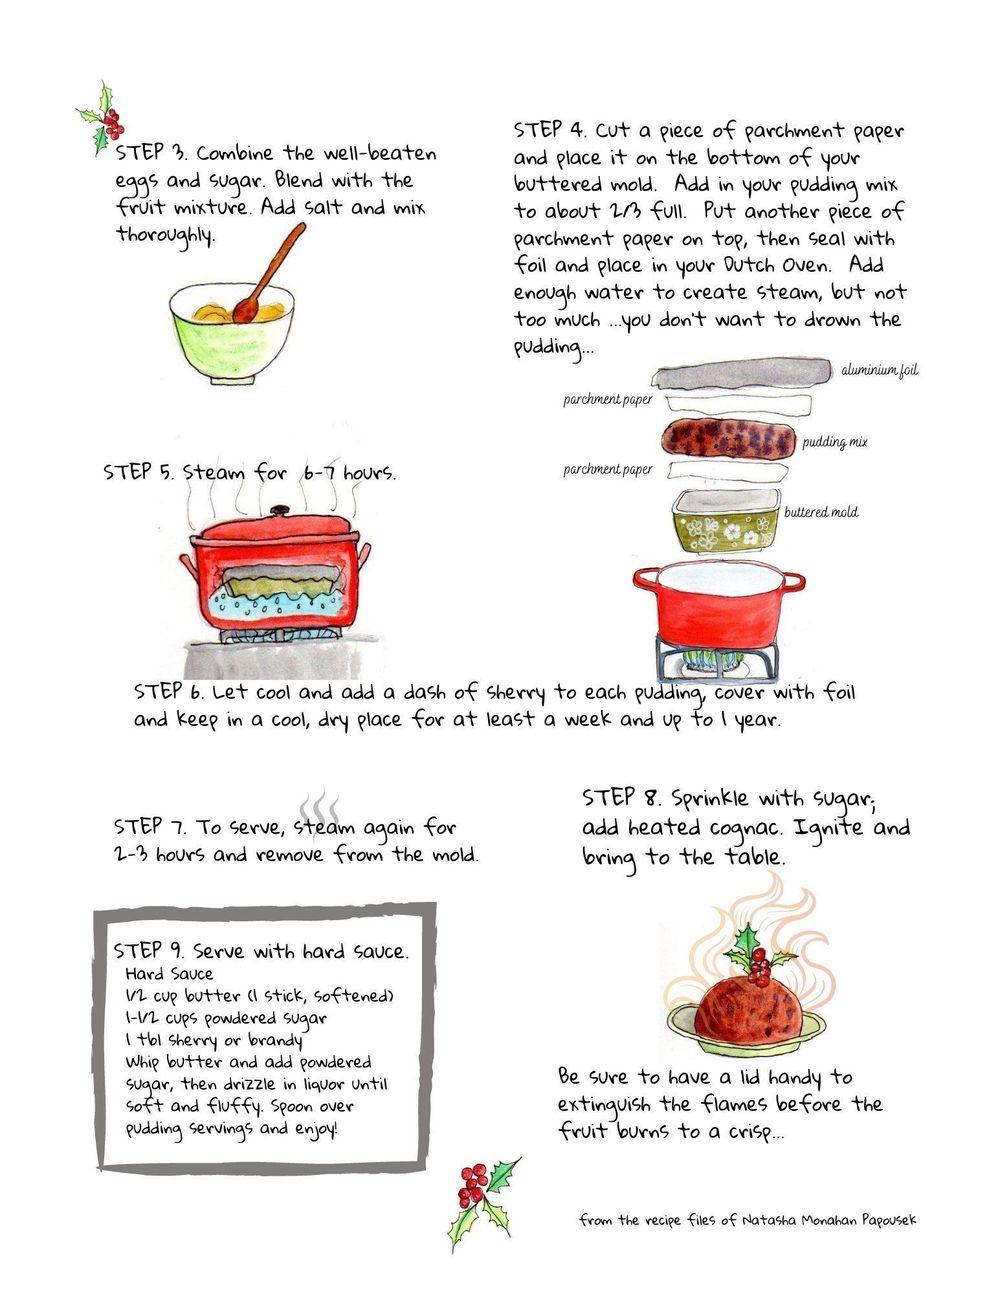 Proper British Plum Pudding - image 1 - student project